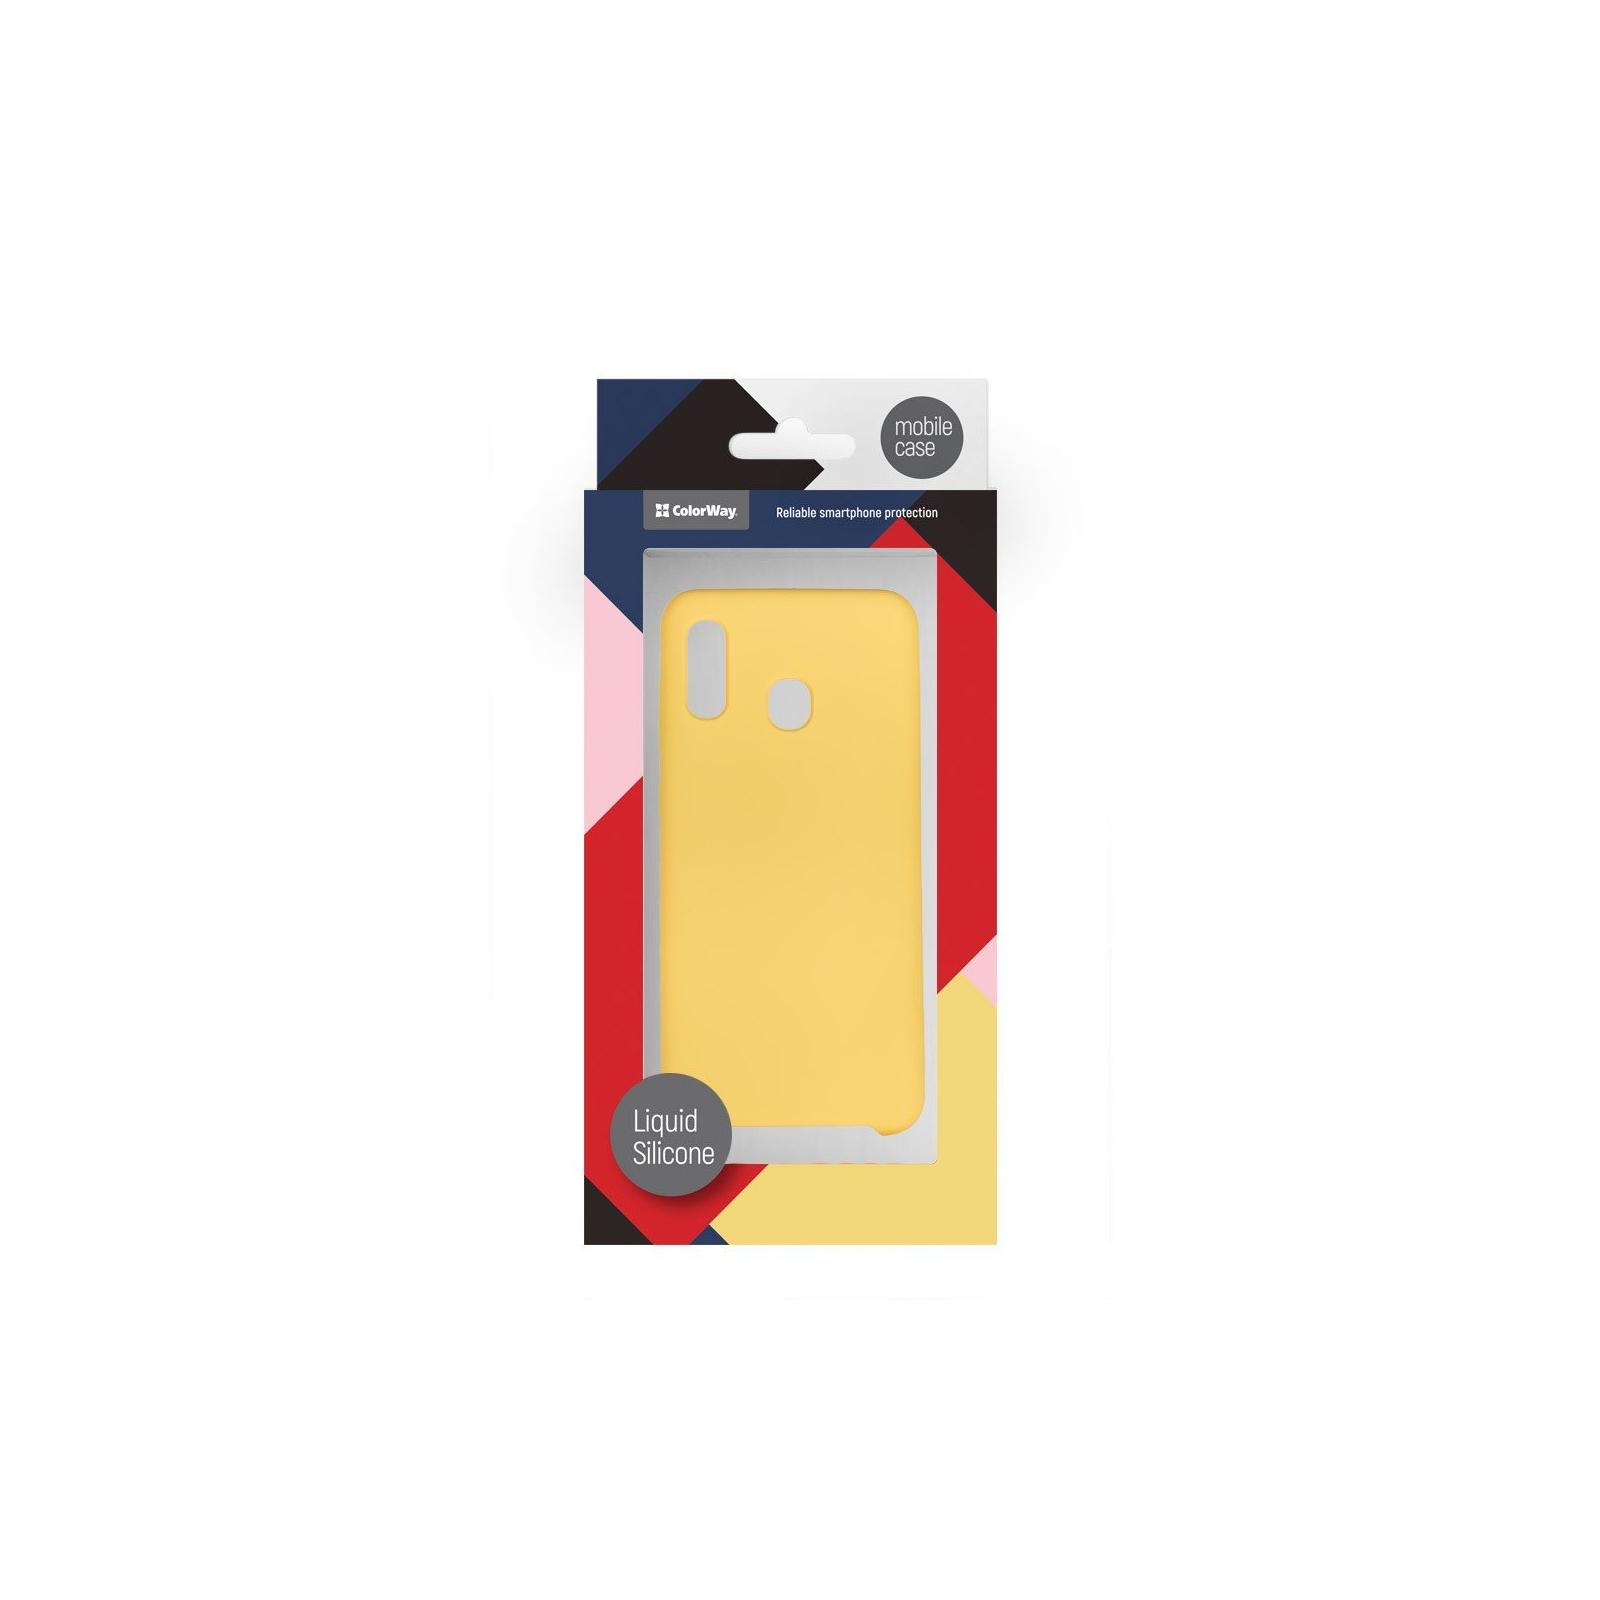 Чехол для моб. телефона ColorWay ColorWay Liquid Silicone для Samsung Galaxy A30 Red (CW-CLSSGA305-RD) изображение 5